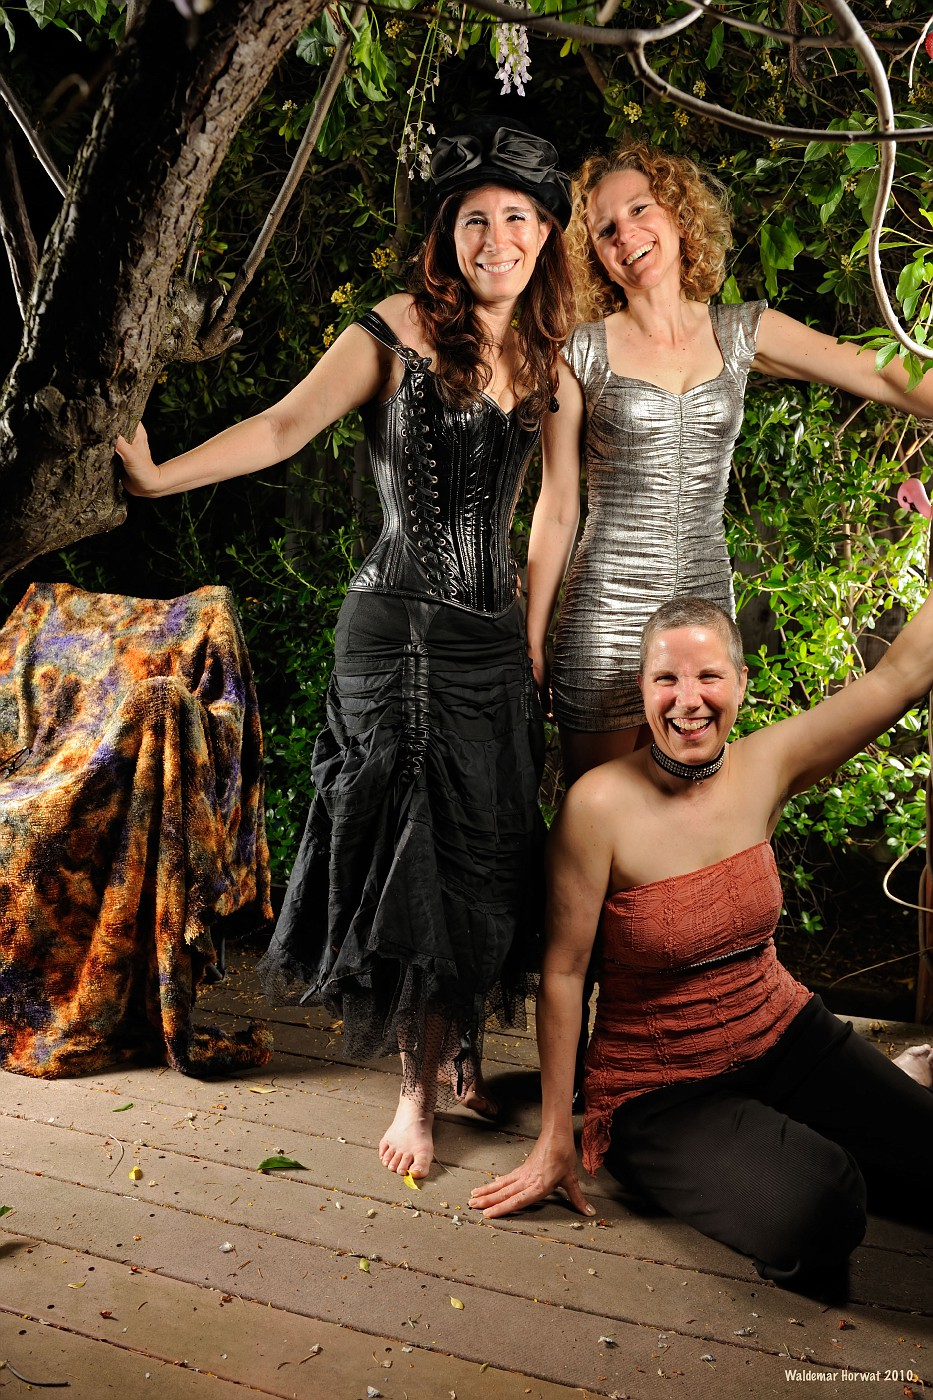 Melanie, Mango, and Anabelle